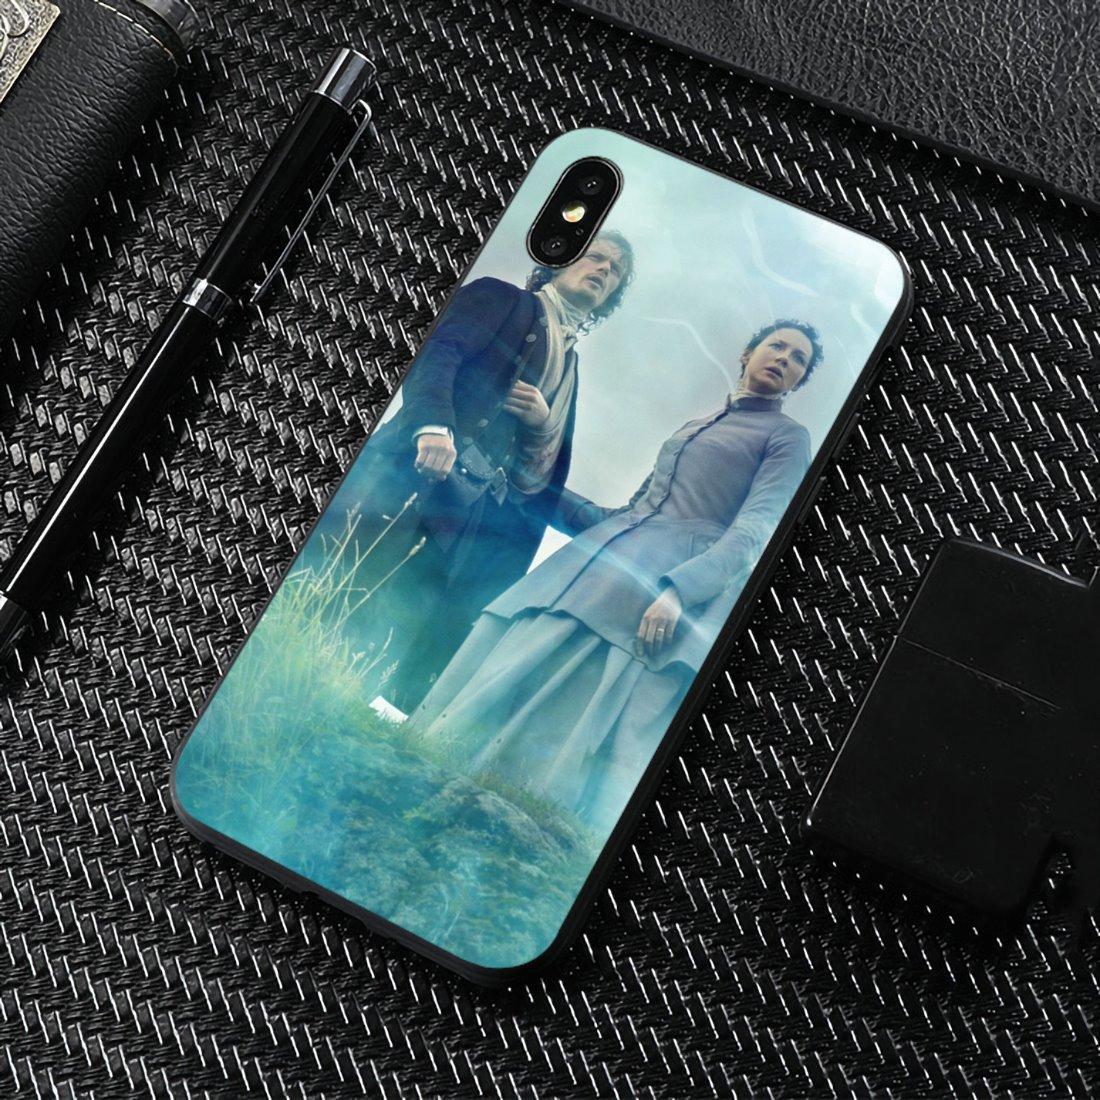 Greatest Silicone Phone Case For Samsung Galaxy A3 A5 A7 A9 A8 Star Lite A6 Plus 2018 2015 2016 2017 OUTLANDER TV Jamie Fraser